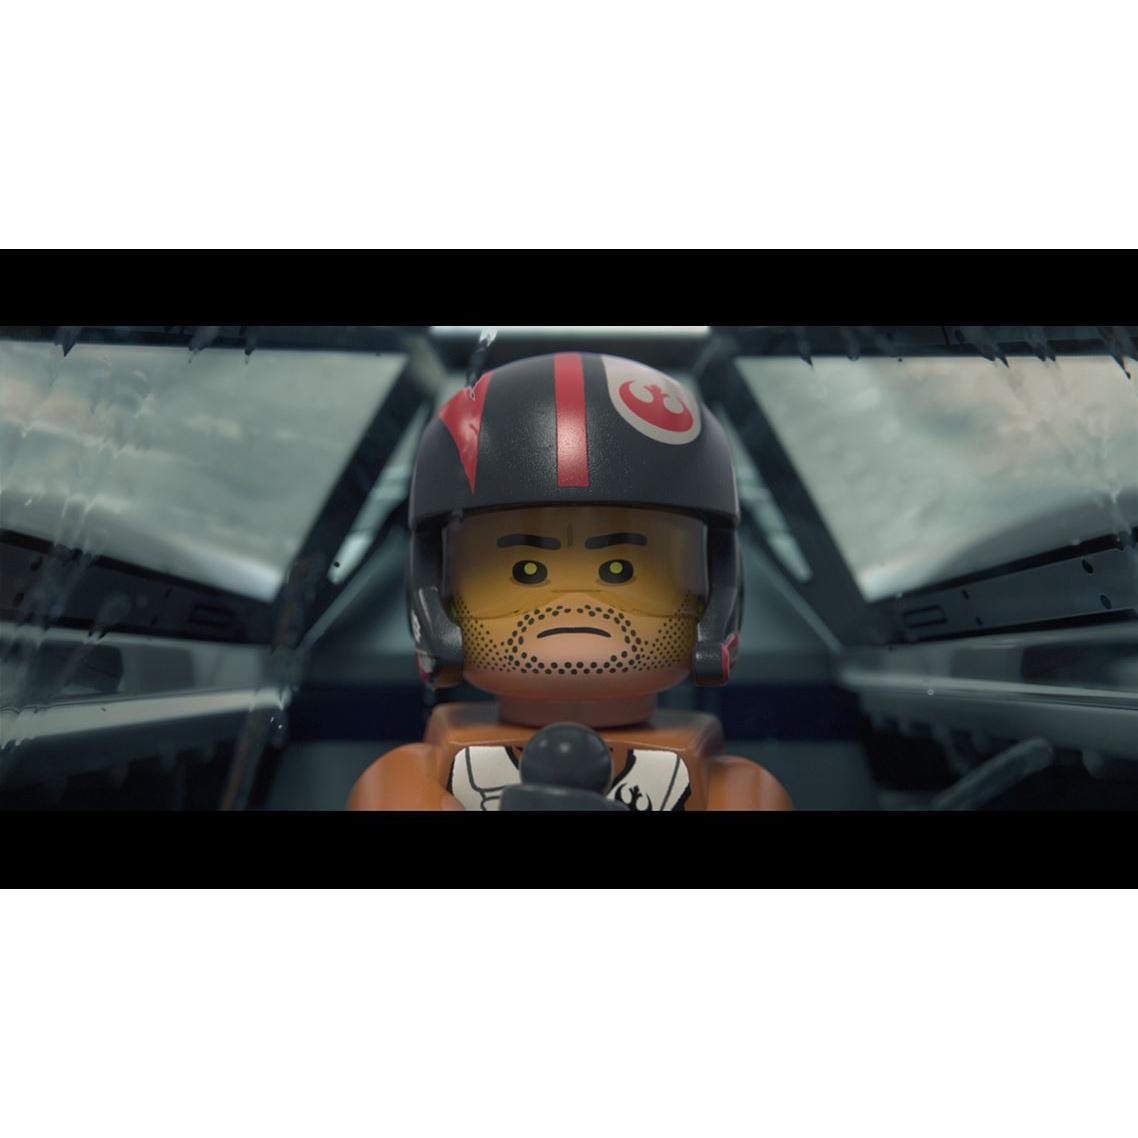 Joc LEGO : STAR WARS THE FORCE AWAKENS pentru PC 2